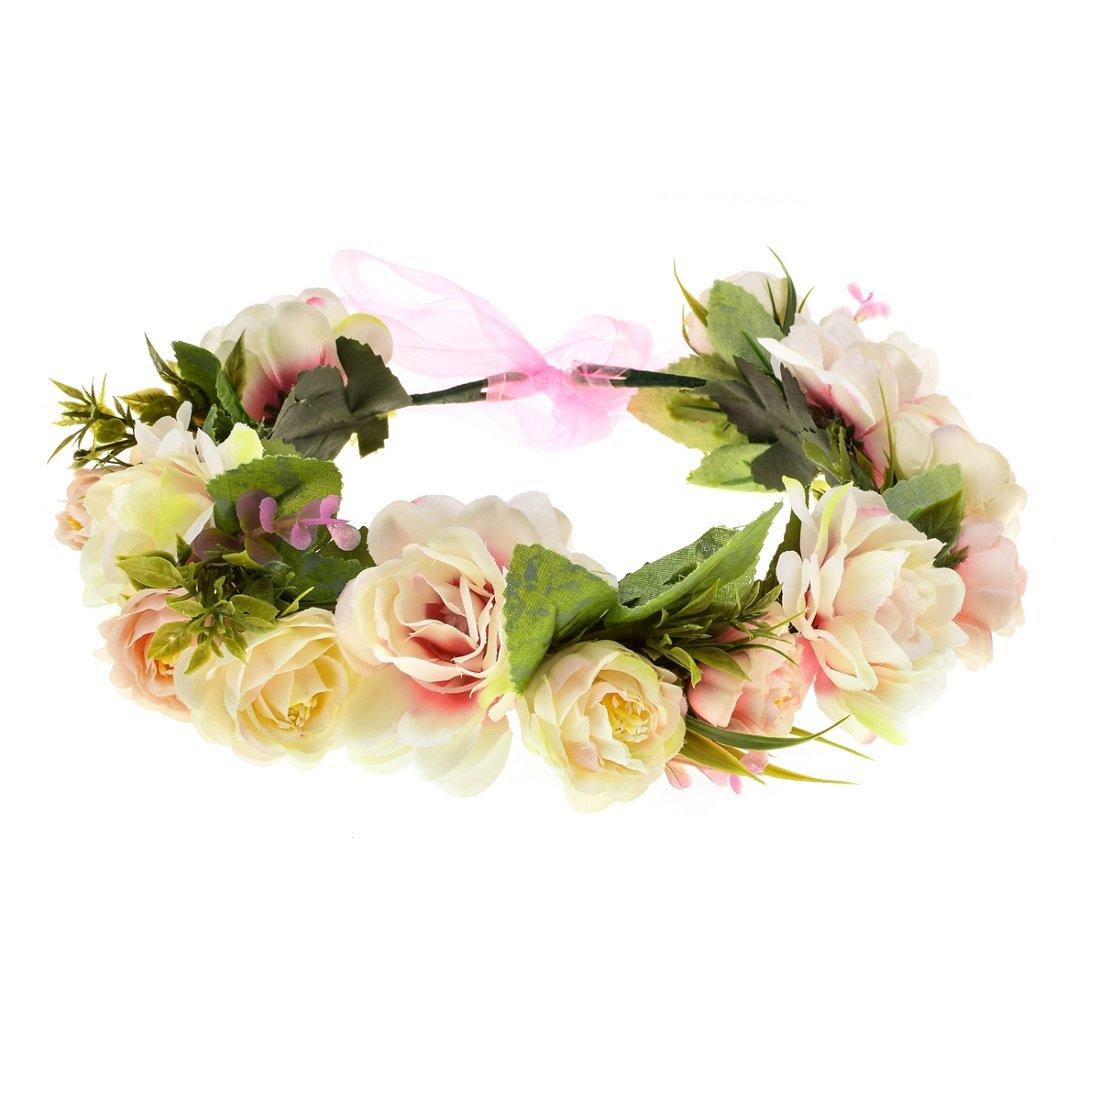 Vividsun Flower Crown Floral Headpiece Festival Wedding Hair Wreath Floral Crown (C/champagne)